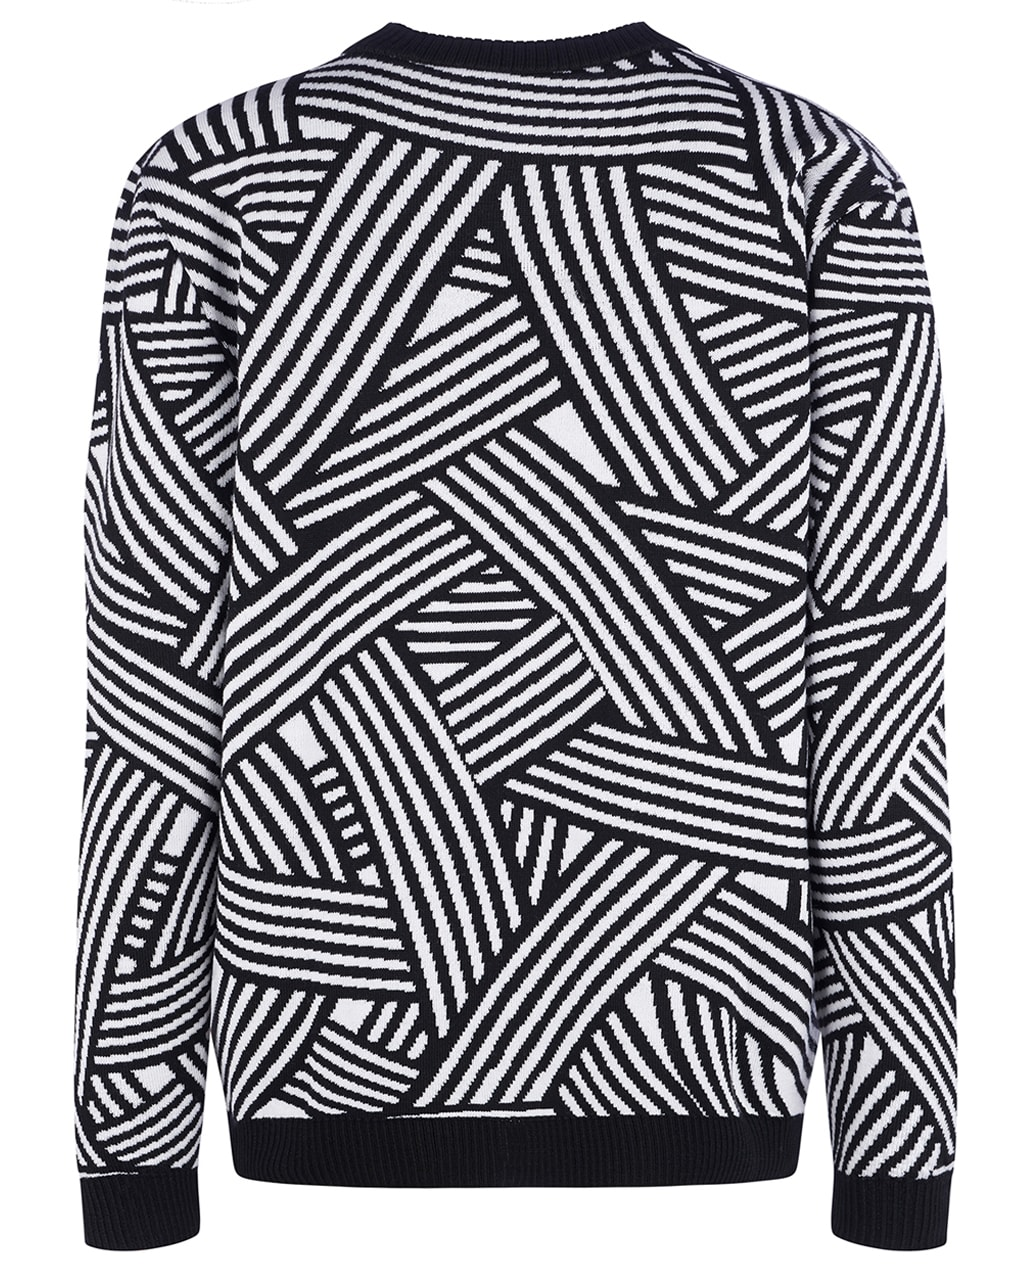 Geometric Striped Jumper